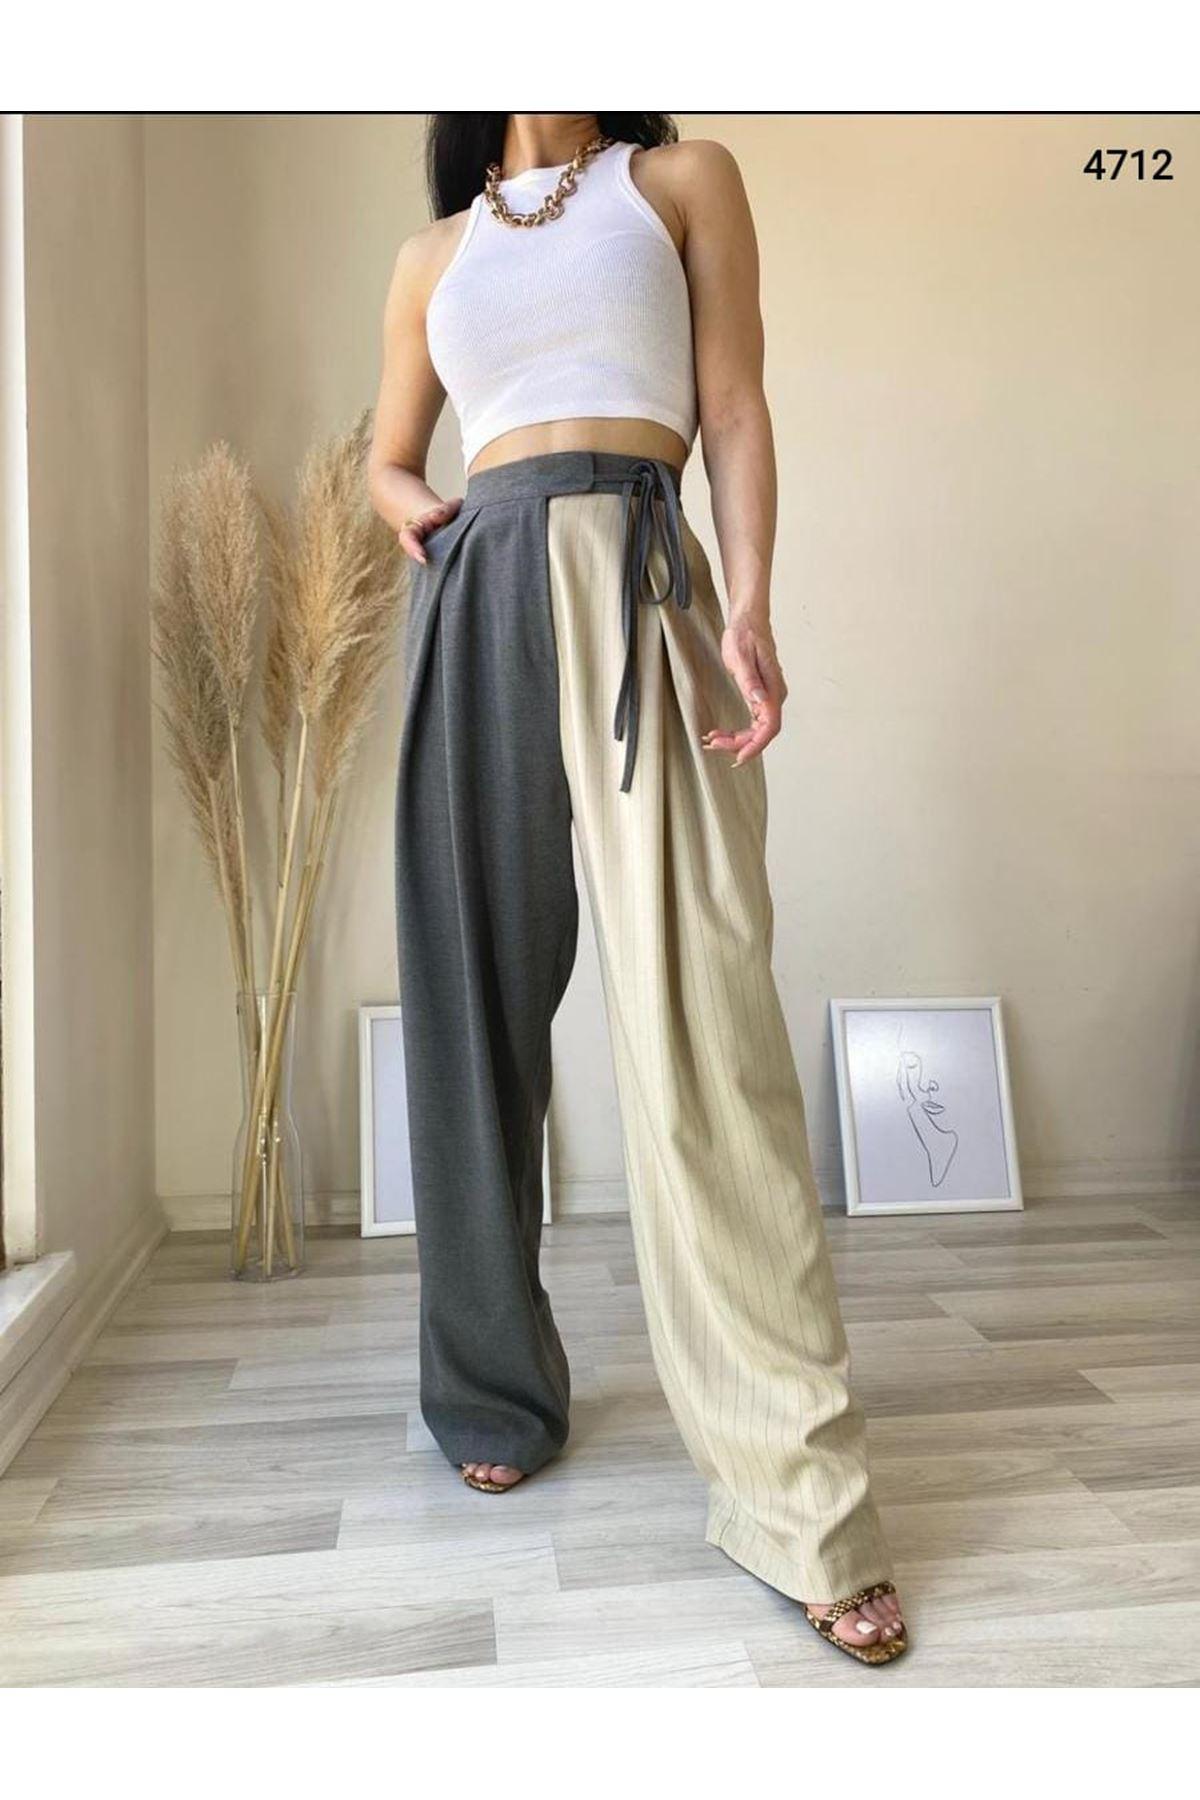 Bağcık Detaylı Çift Renk Pantolon - MULTİ